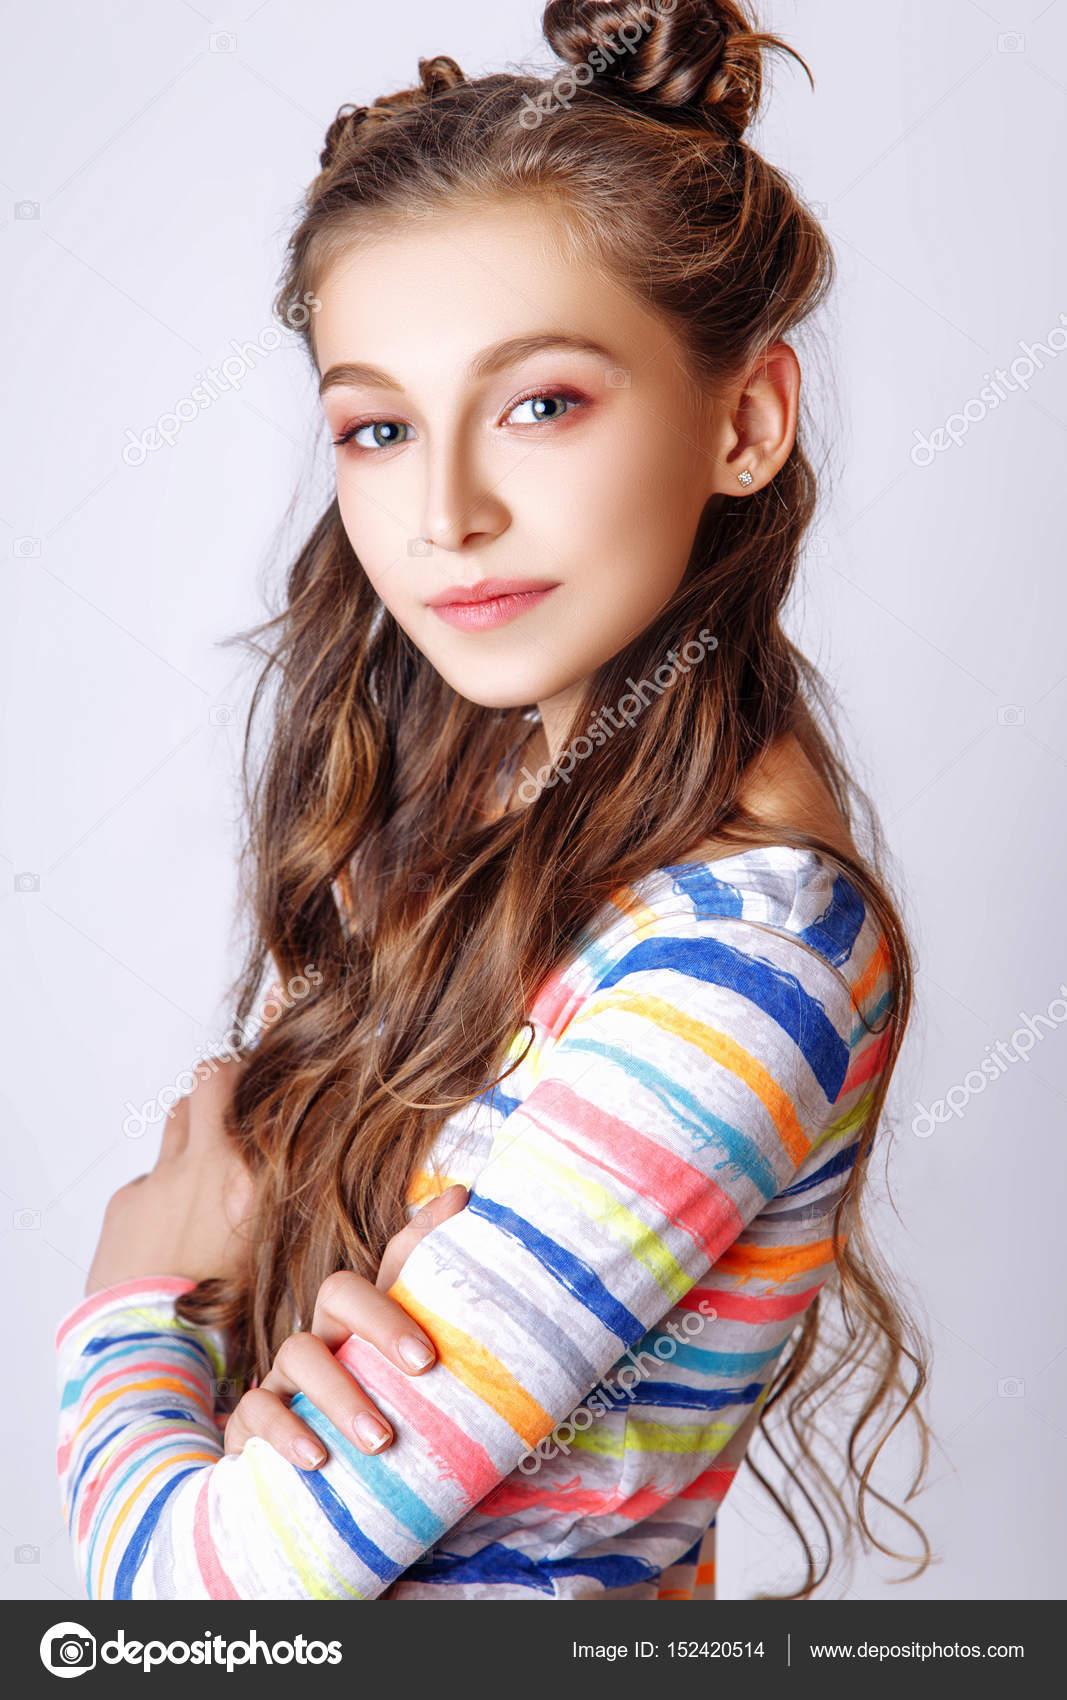 Teenaage girls with curley hair #12